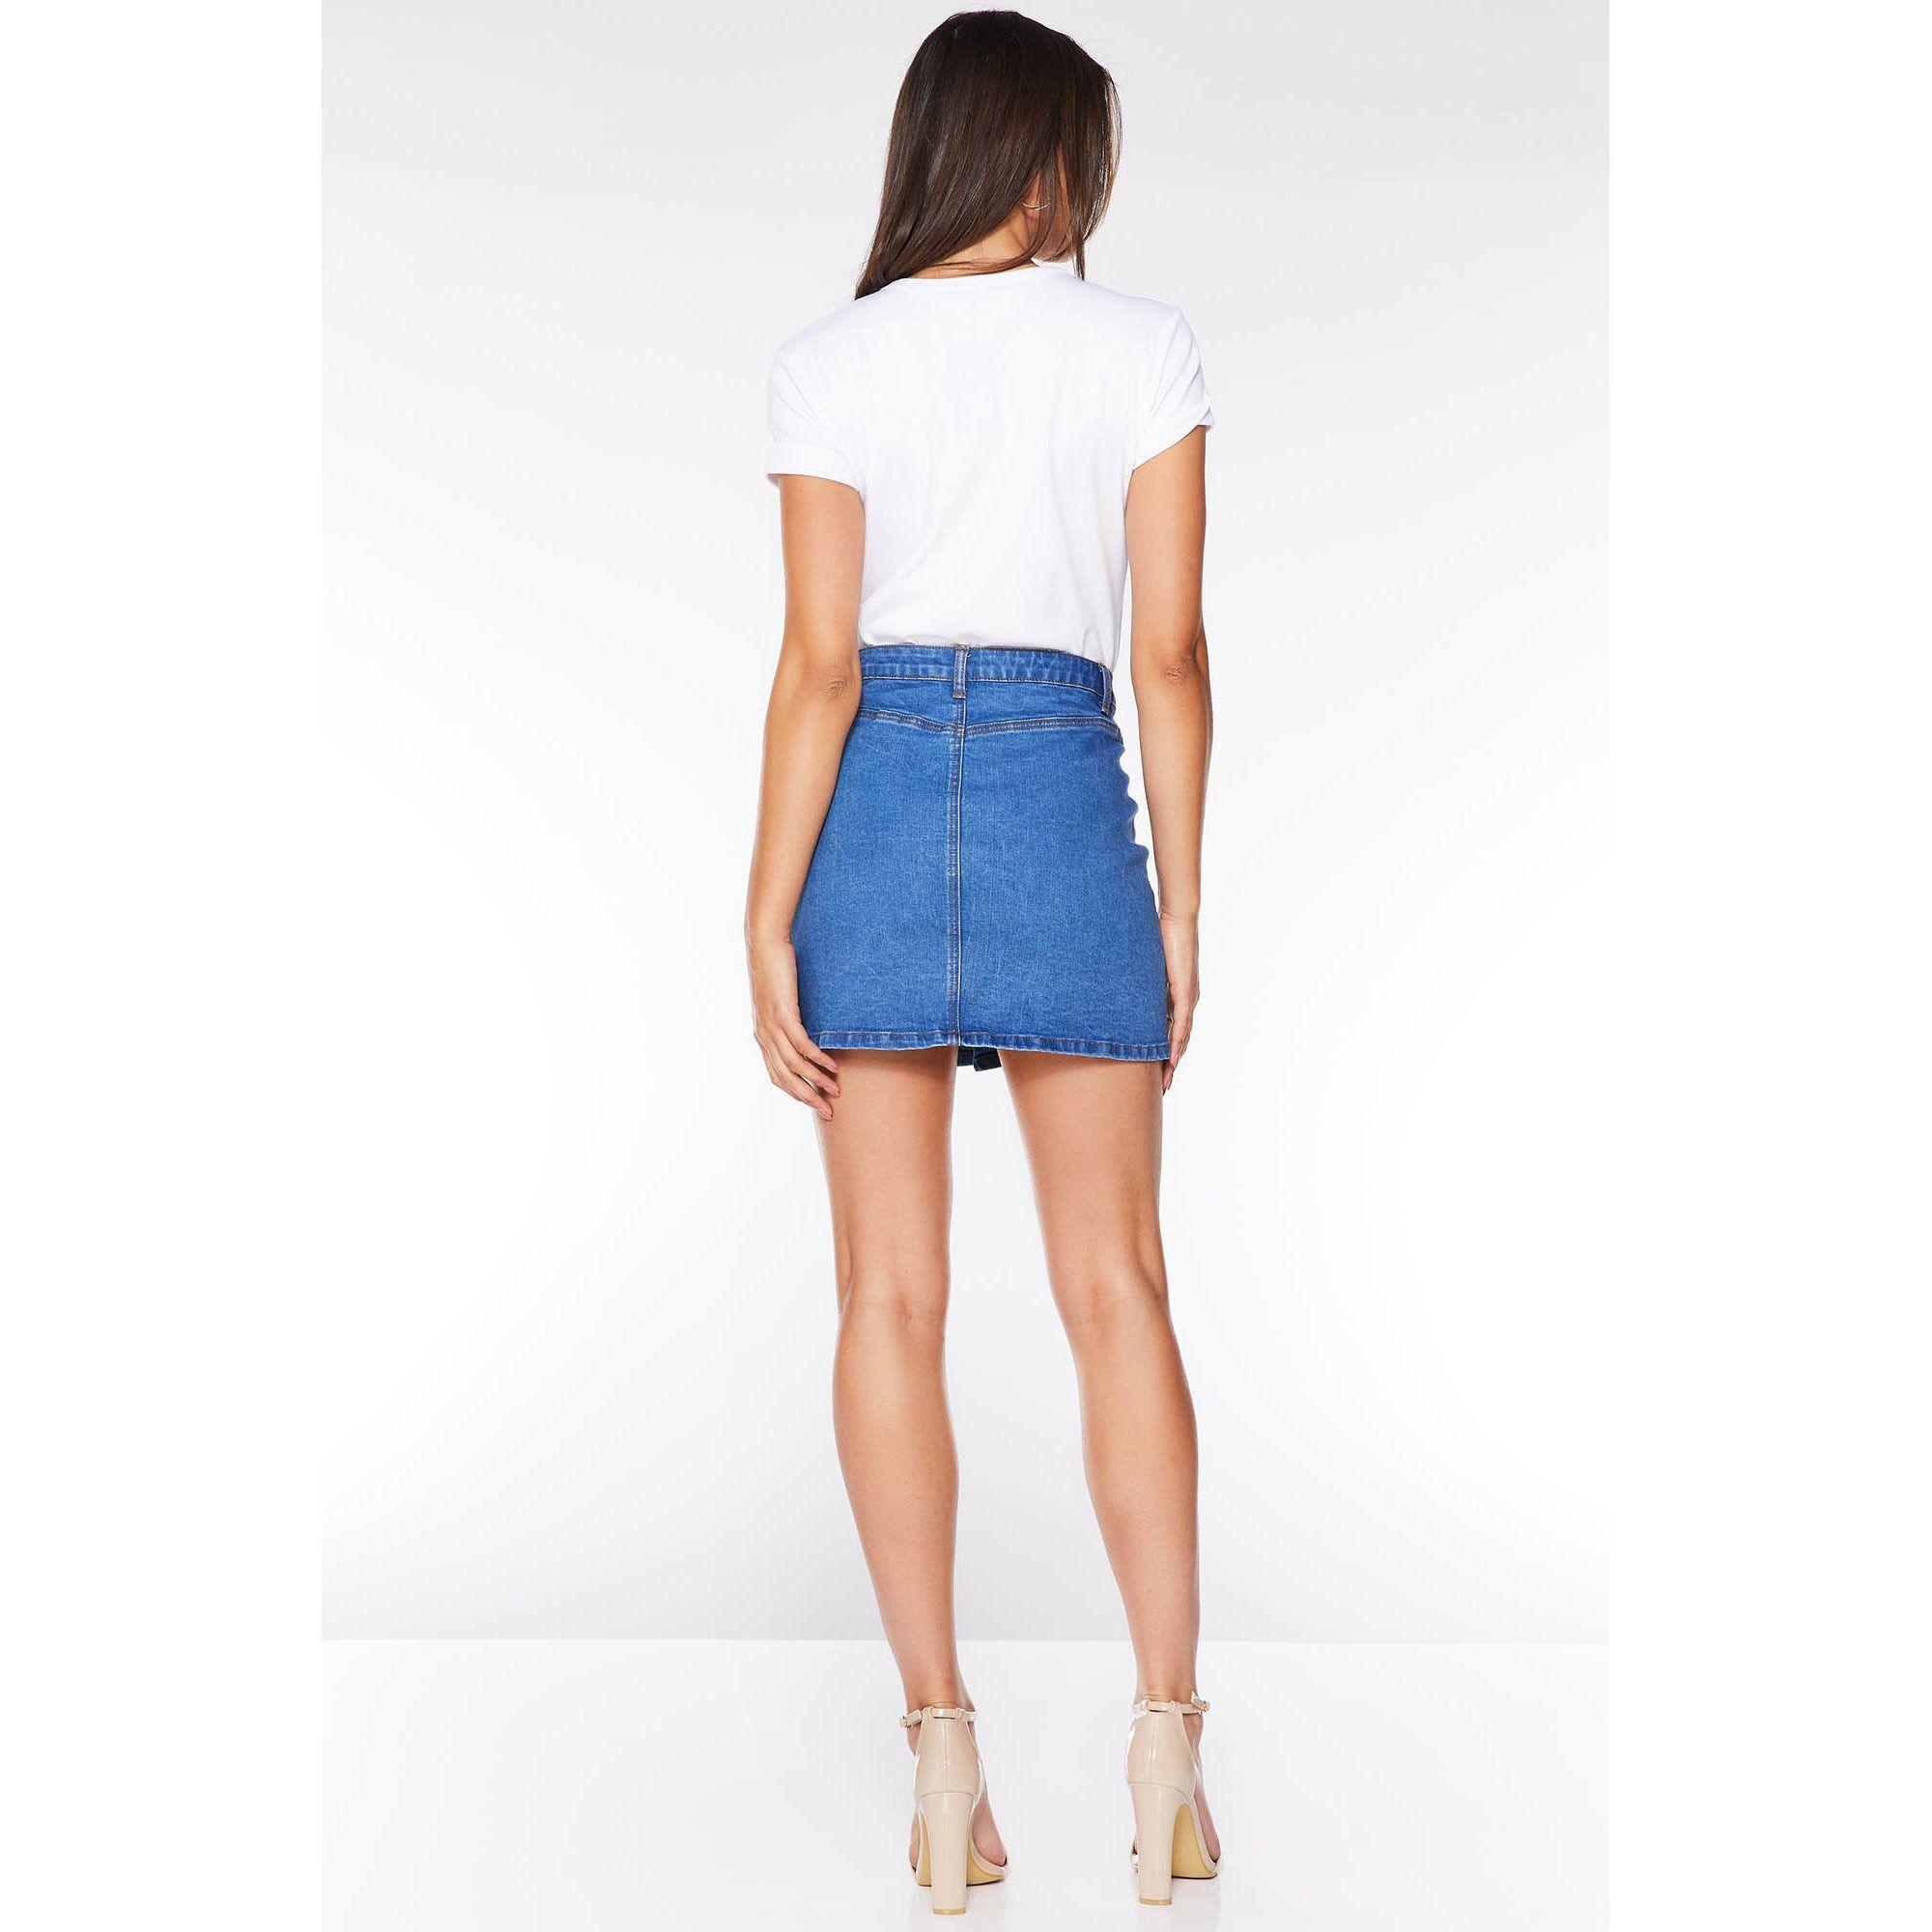 005e78b90 Quiz Mid Blue Denim Button Front Mini Skirt in Blue - Lyst